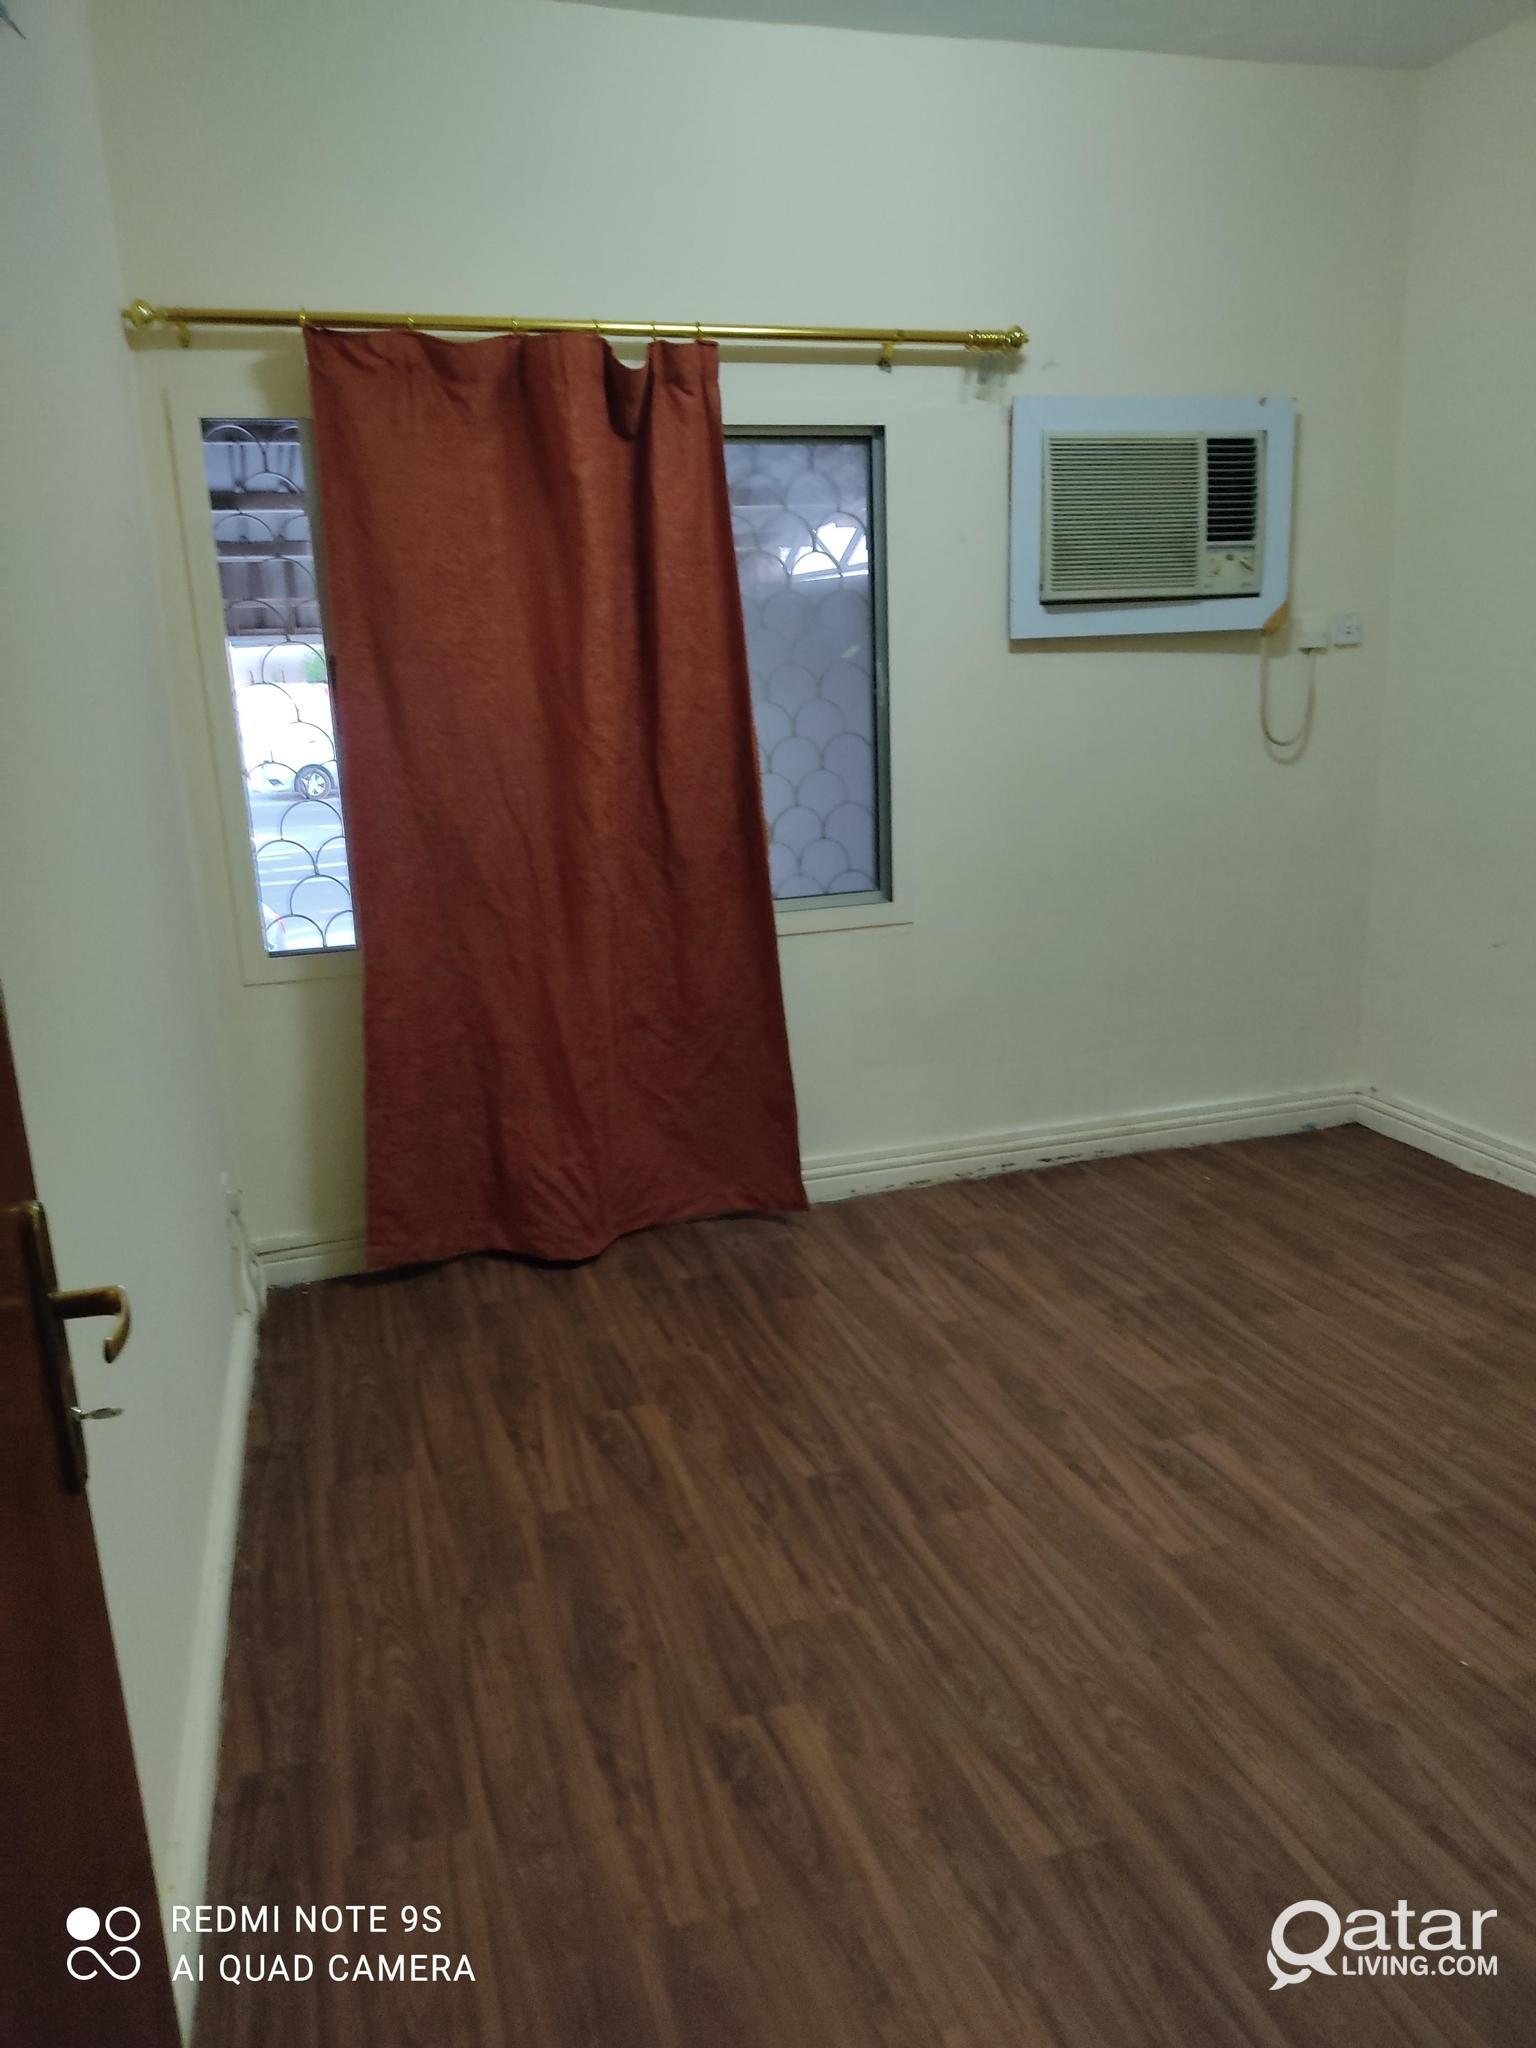 EXECUTIVE BACHELOR ROOMS IN FLATS NAJMA HOT BREAD